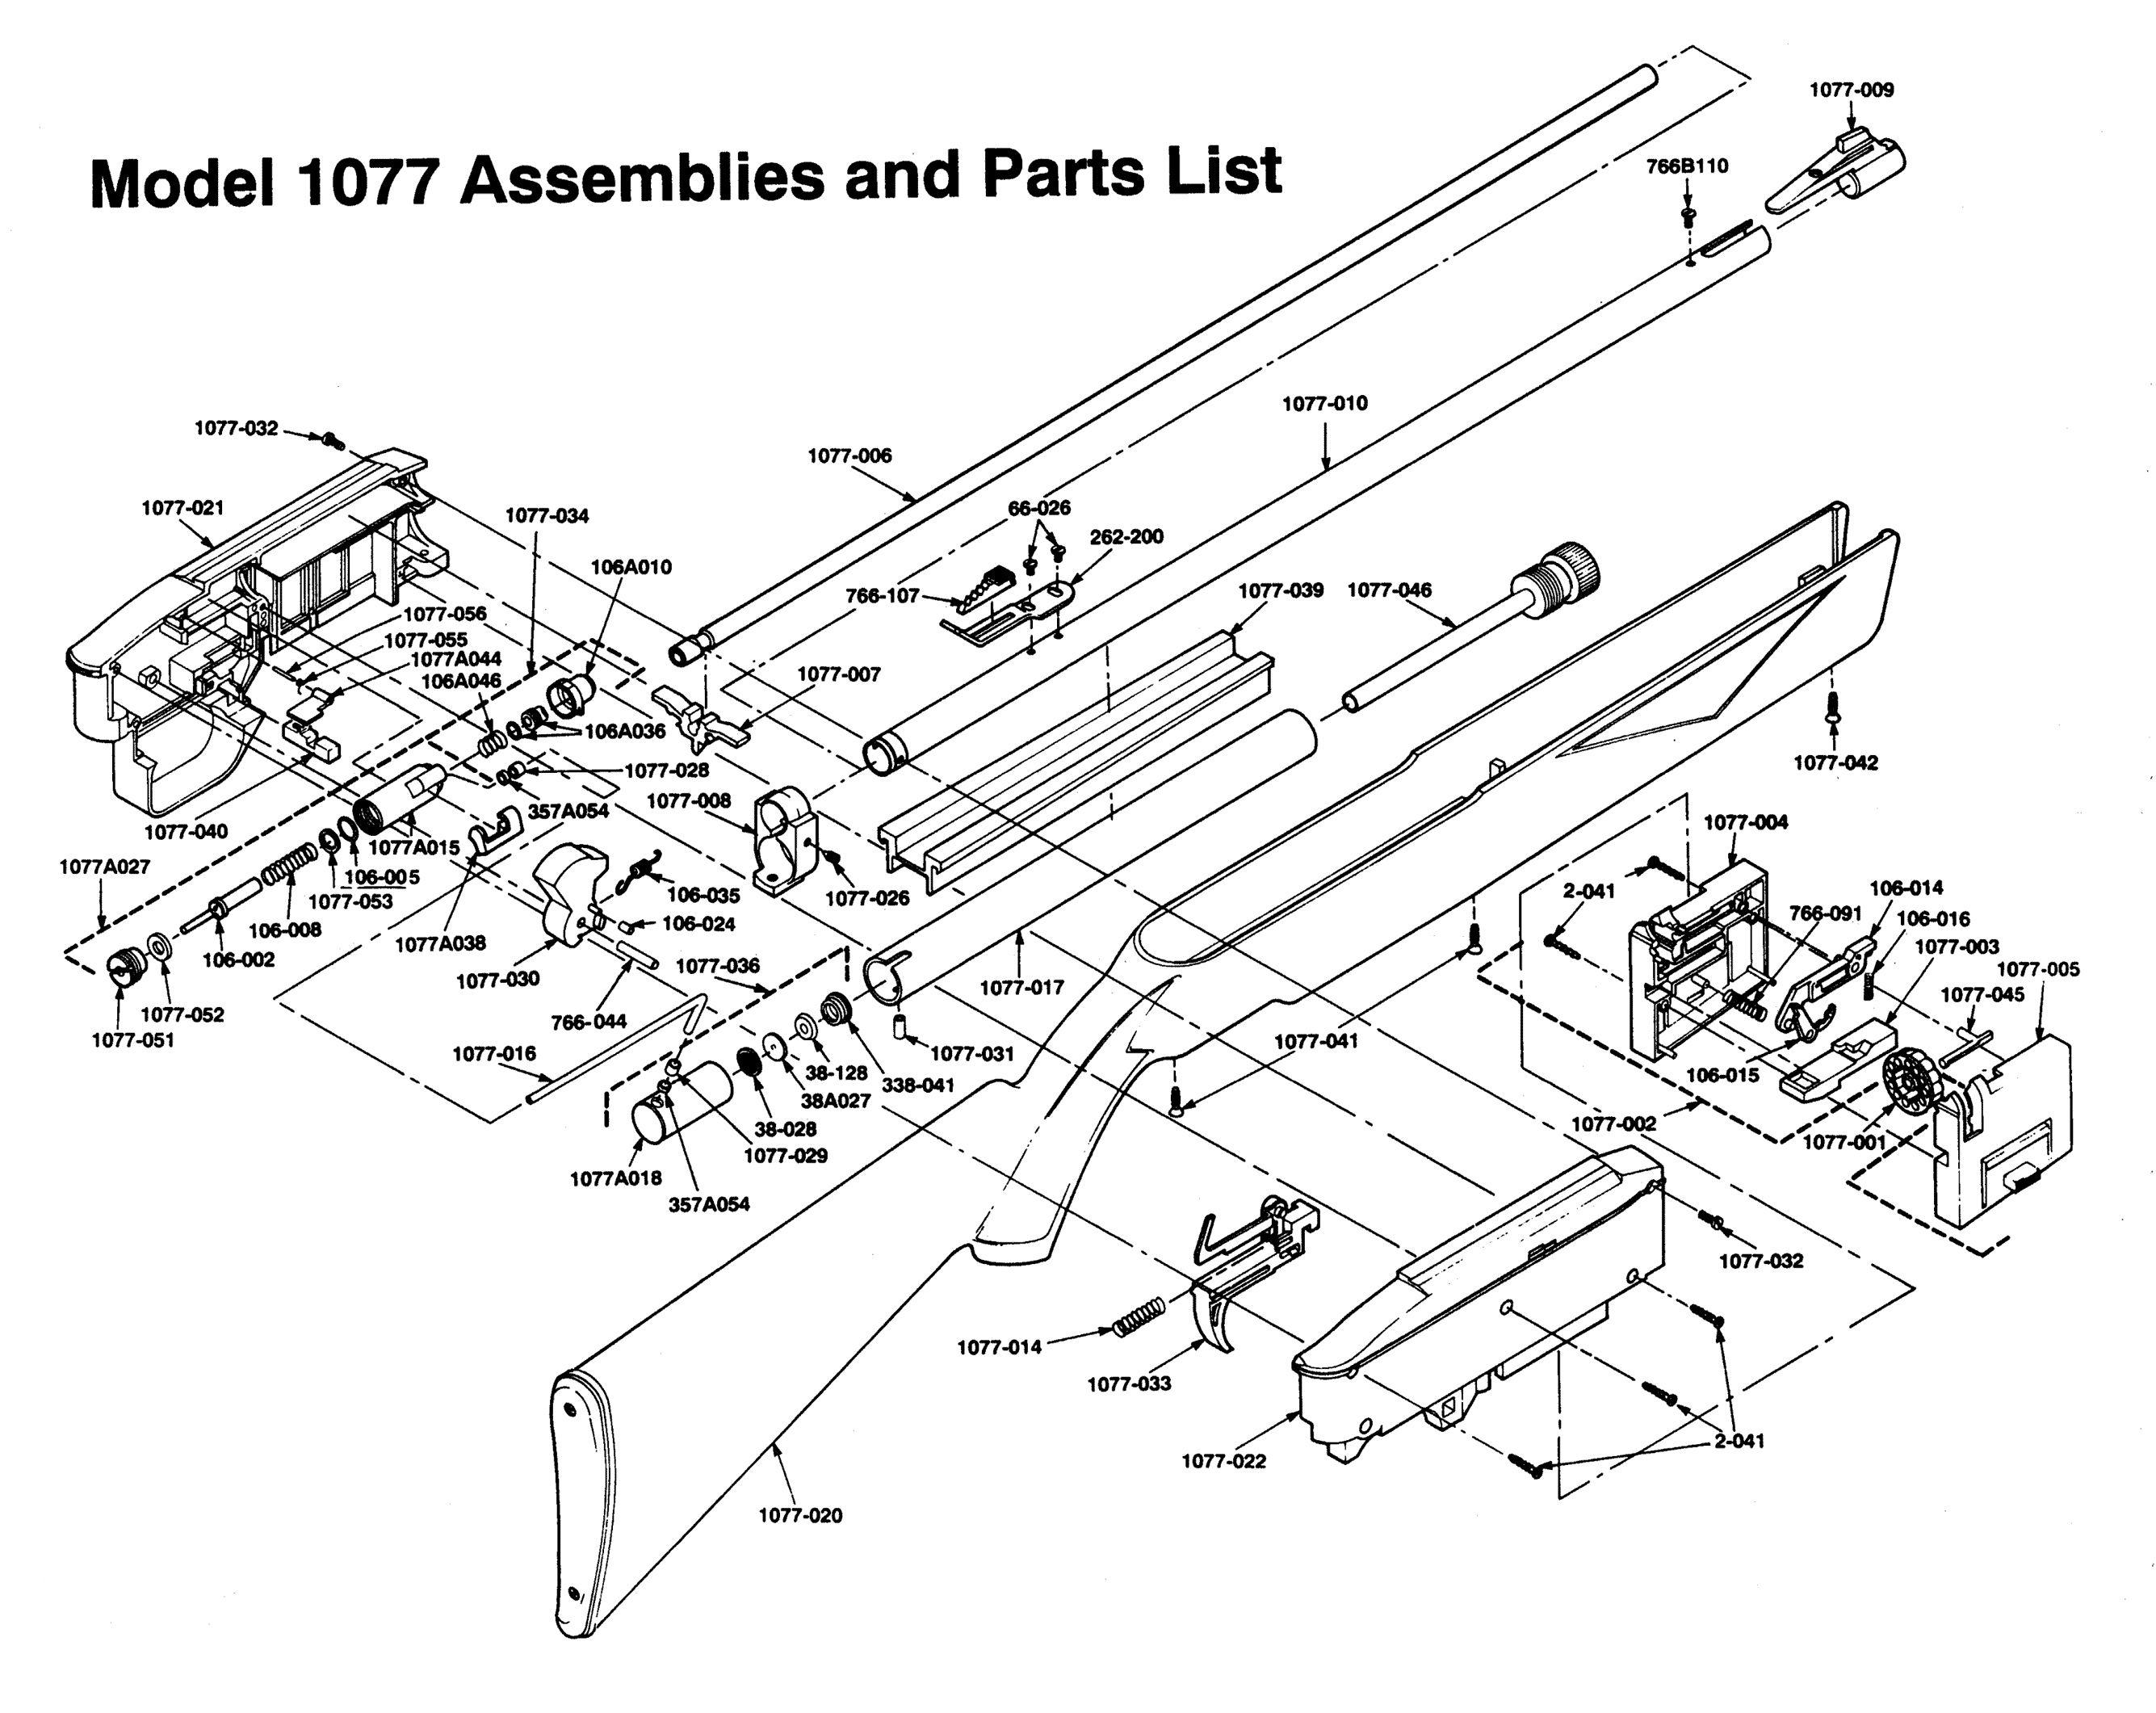 crosman model 1077 assemblies and parts list